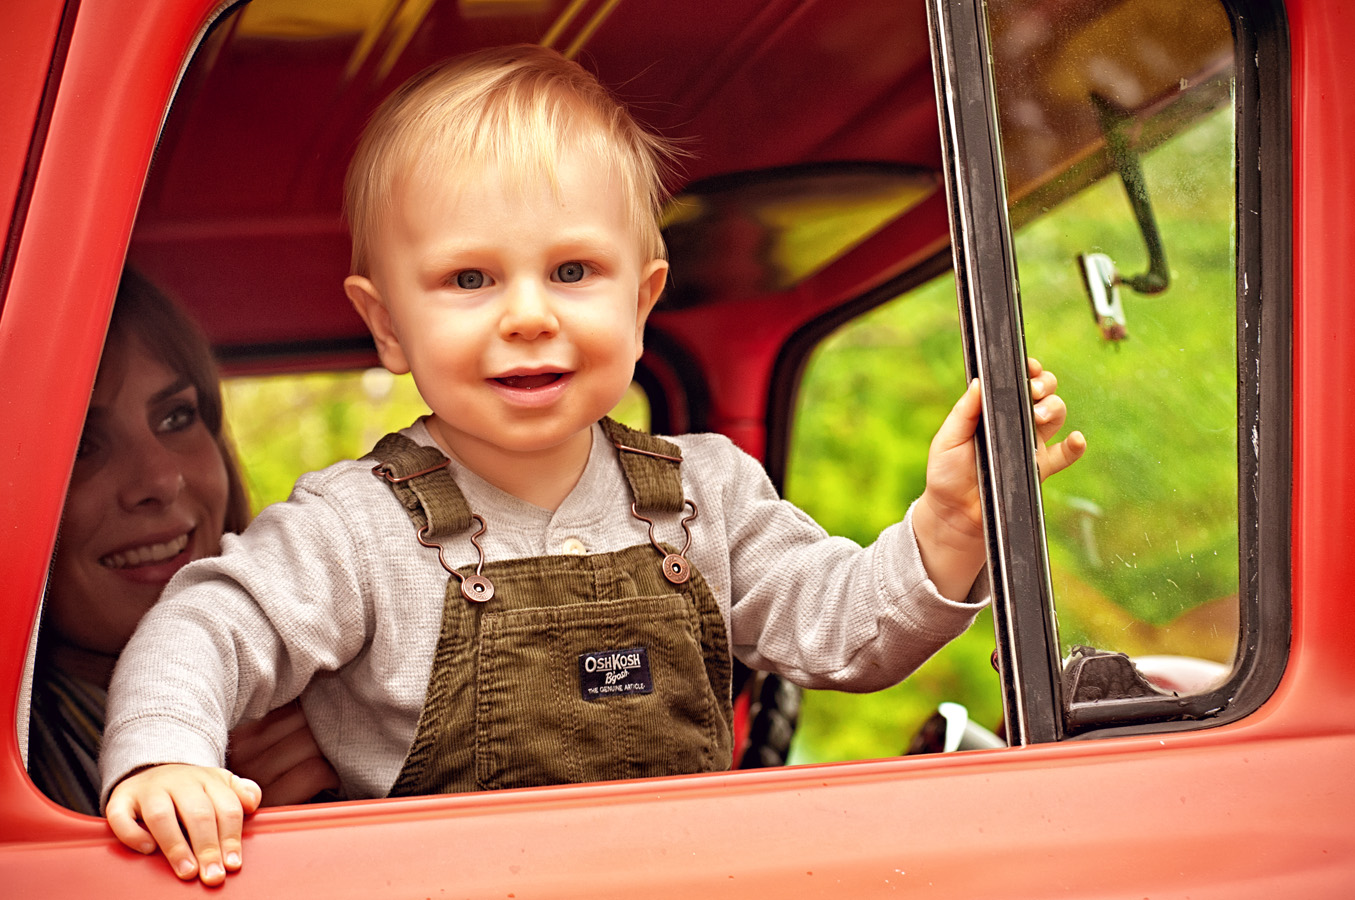 child, truck, outdoor, natural light, Northern VA